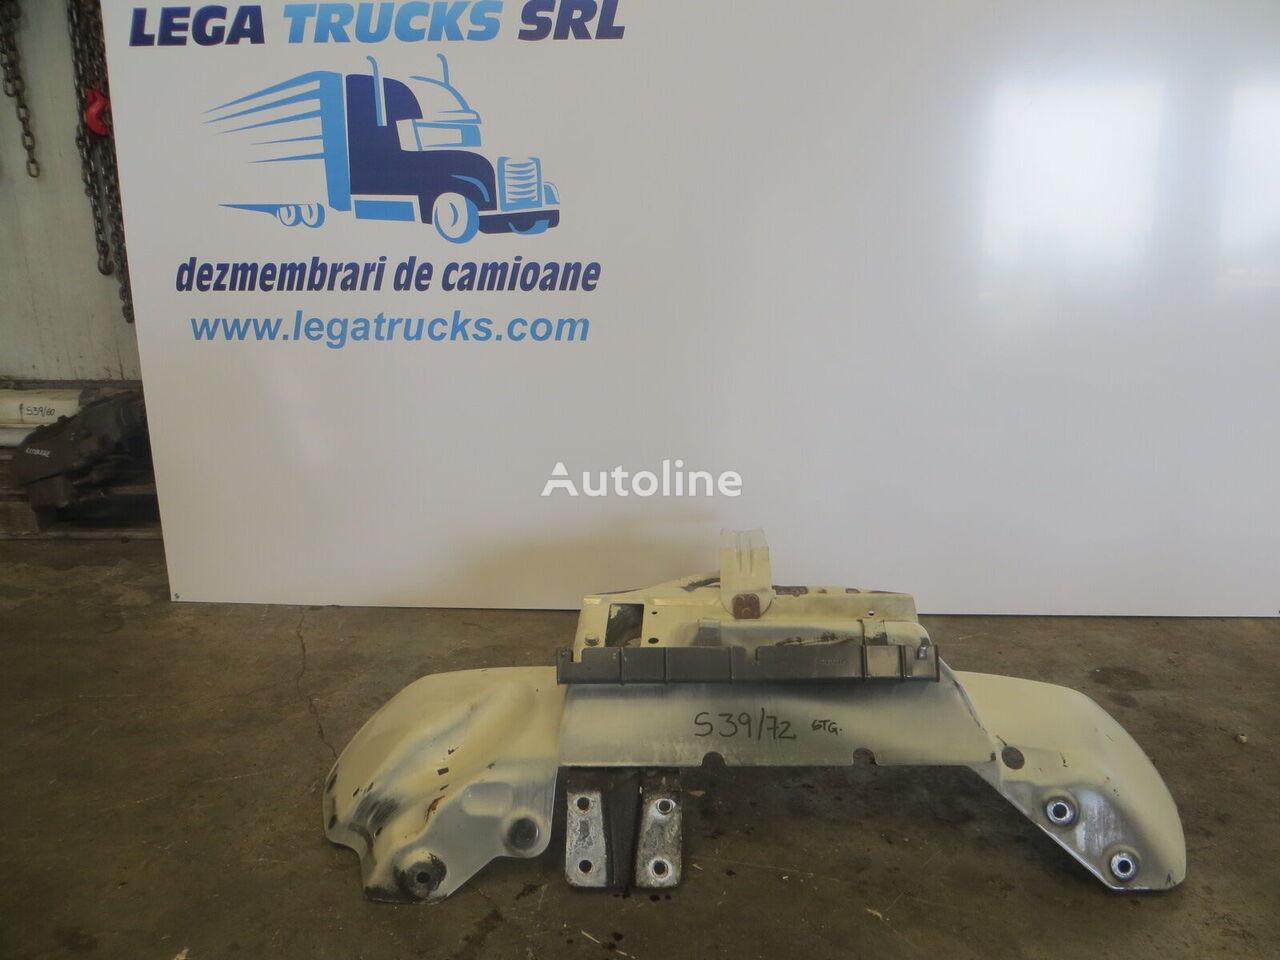 крепежные элементы ARIPA AXA FATA STG для тягача SCANIA R480 TOPLINE EURO 6